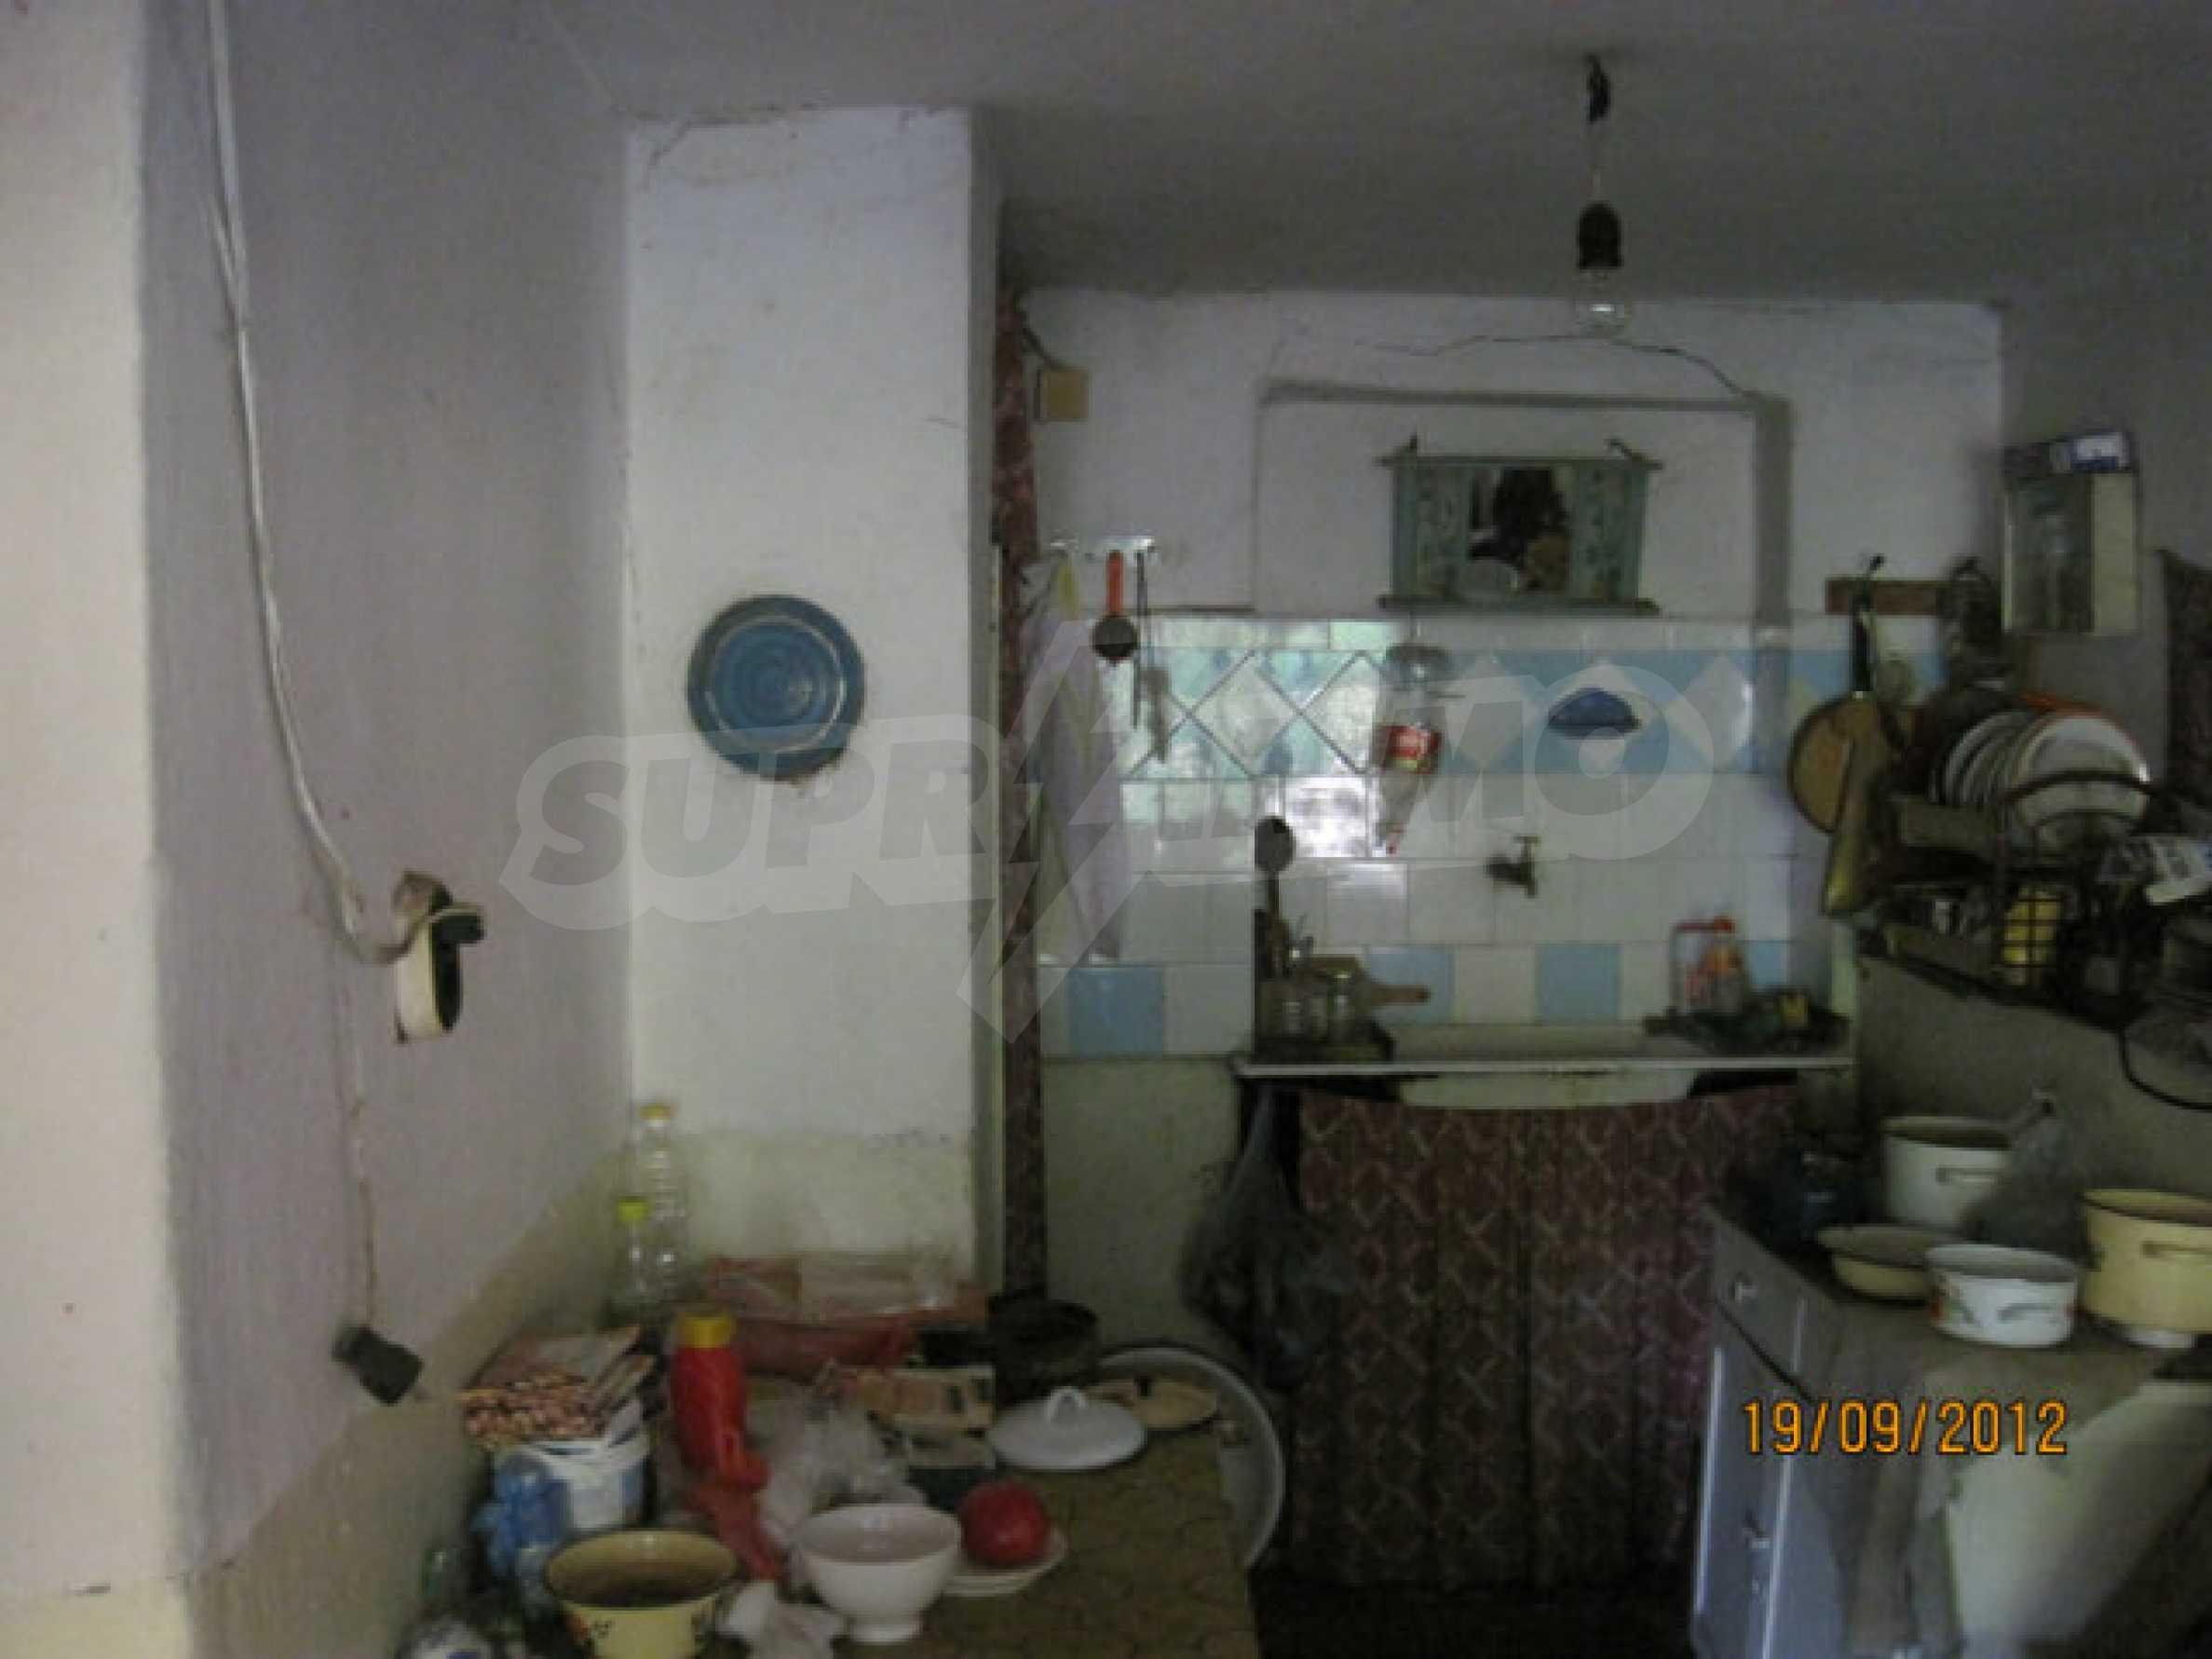 Detached house for sale in a quiet village near Dimitrovgrad 3